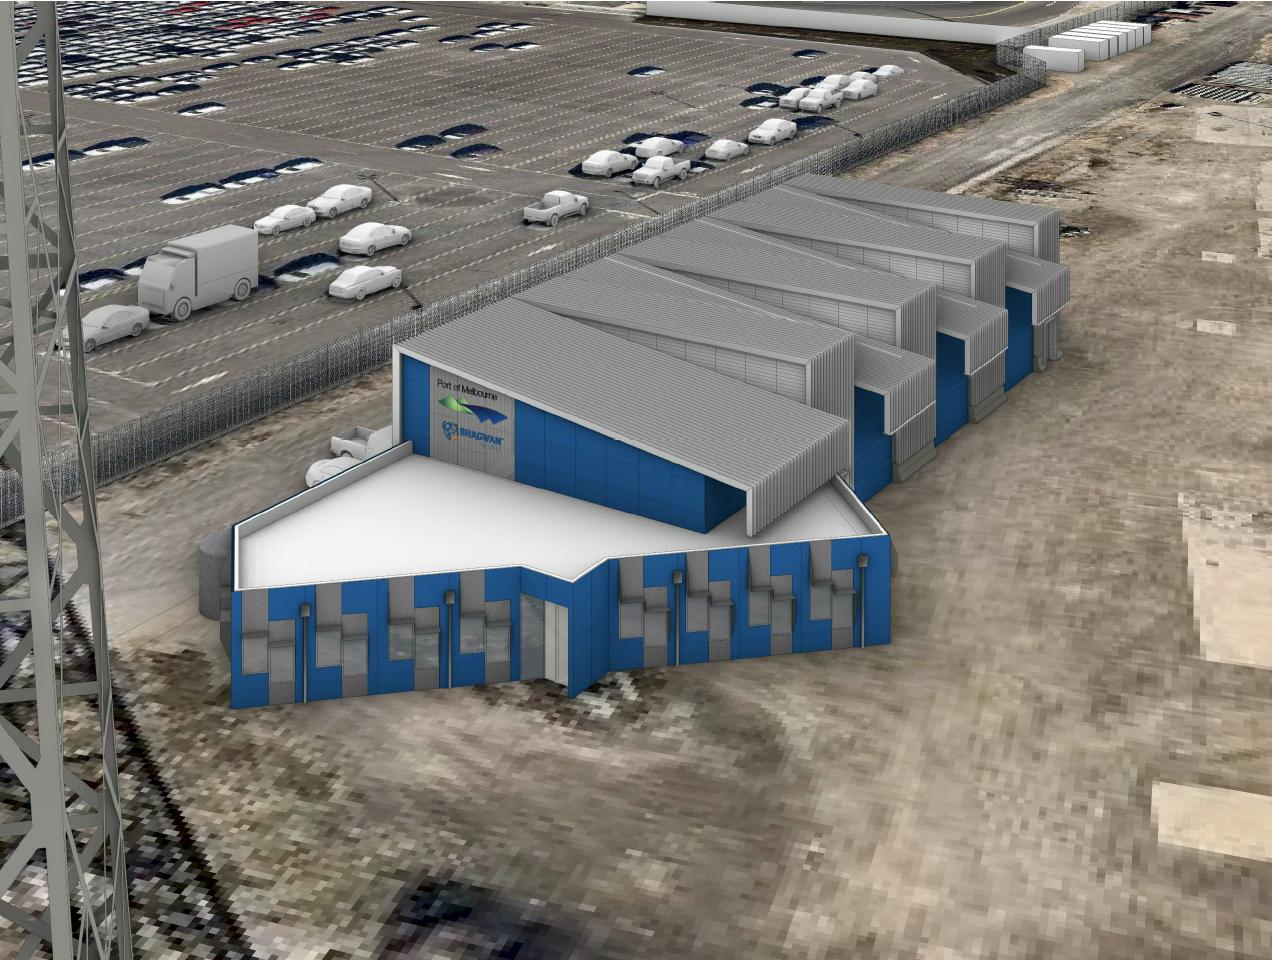 2Construct - POM warehouse